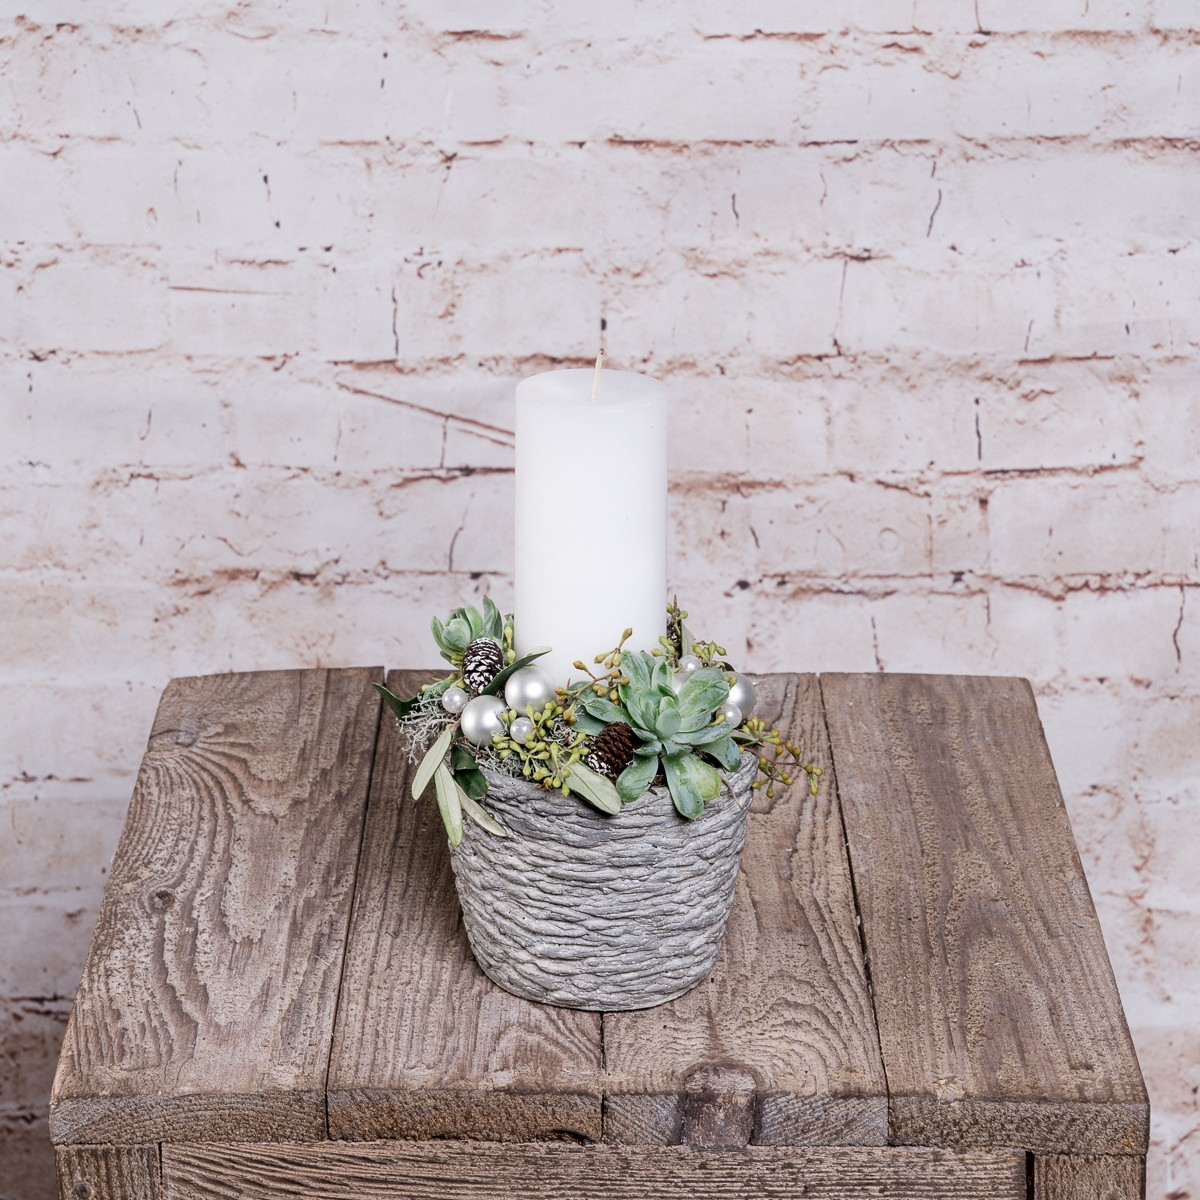 Kleines Kerzengesteck In Silber-Grün Tönen Bild 1